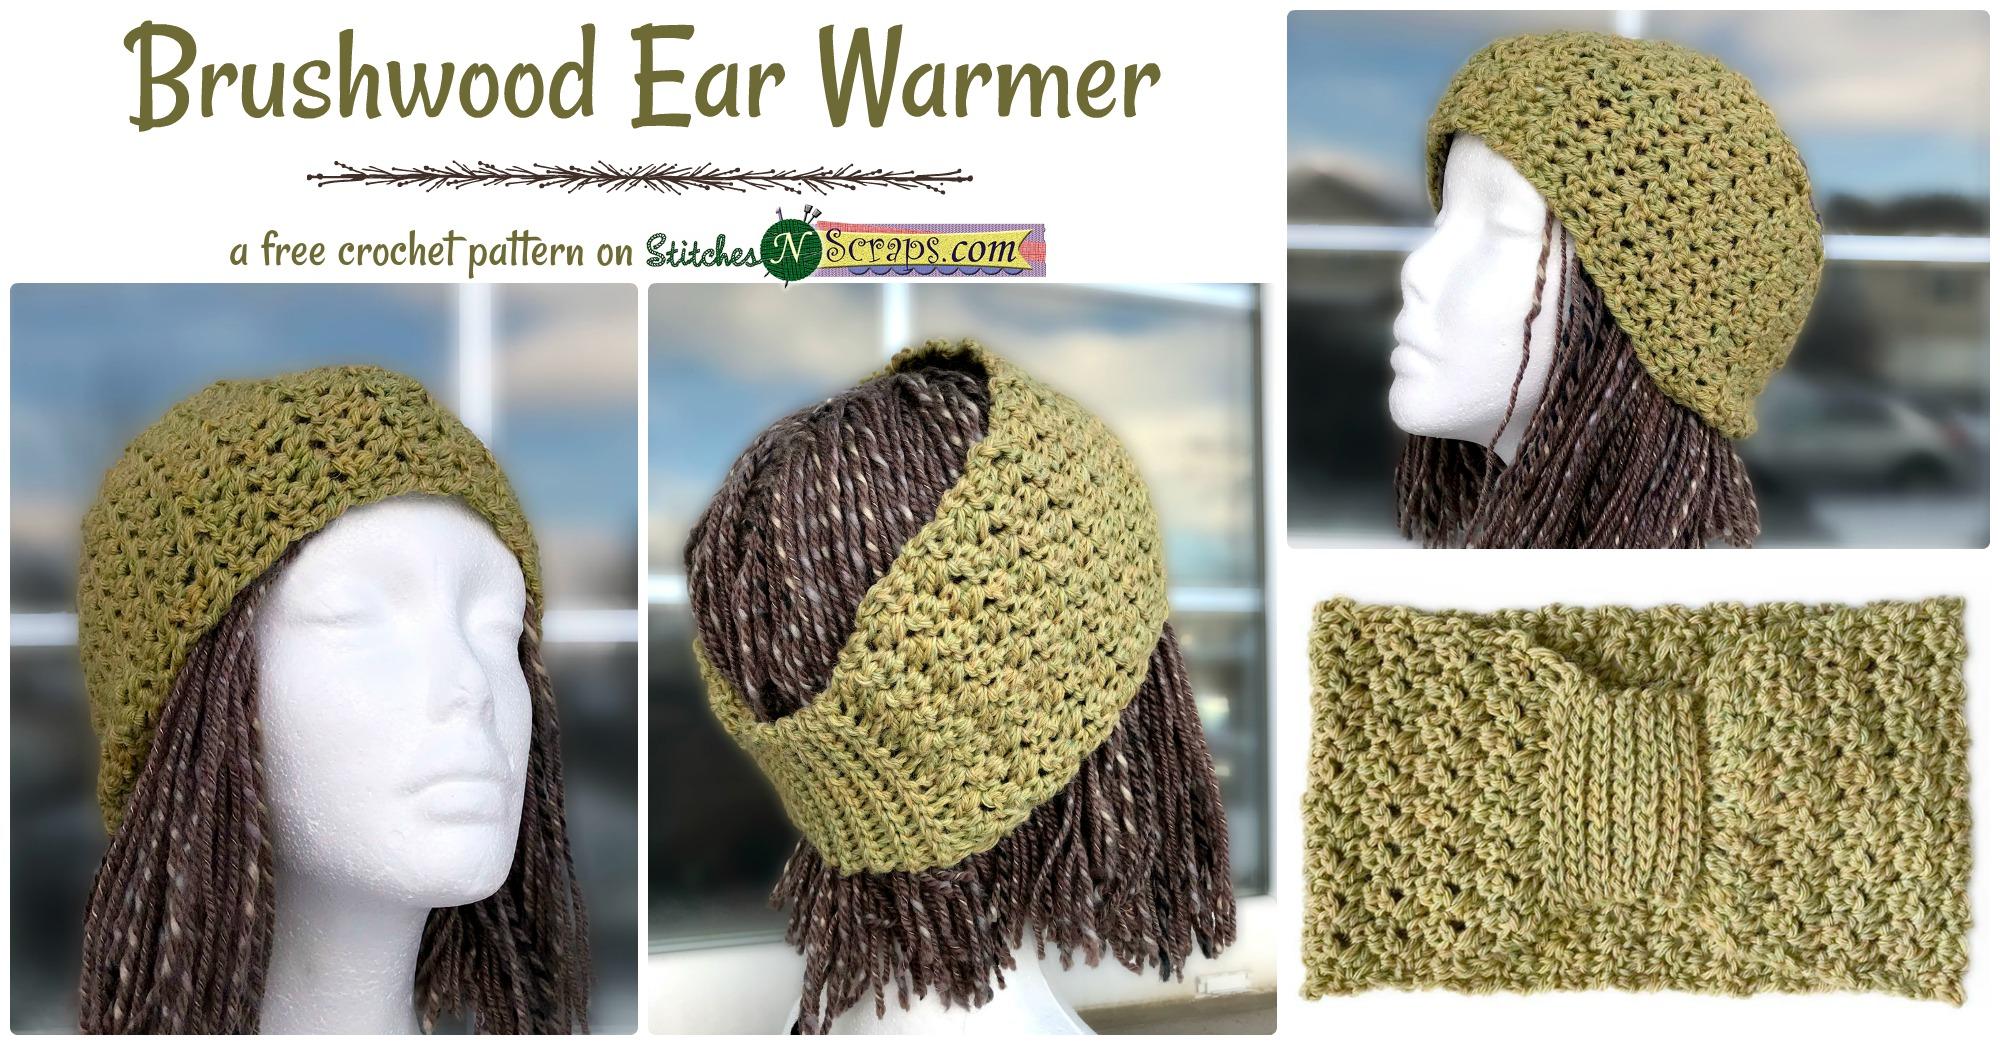 Free Pattern - Brushwood Ear Warmer - Stitches n Scraps